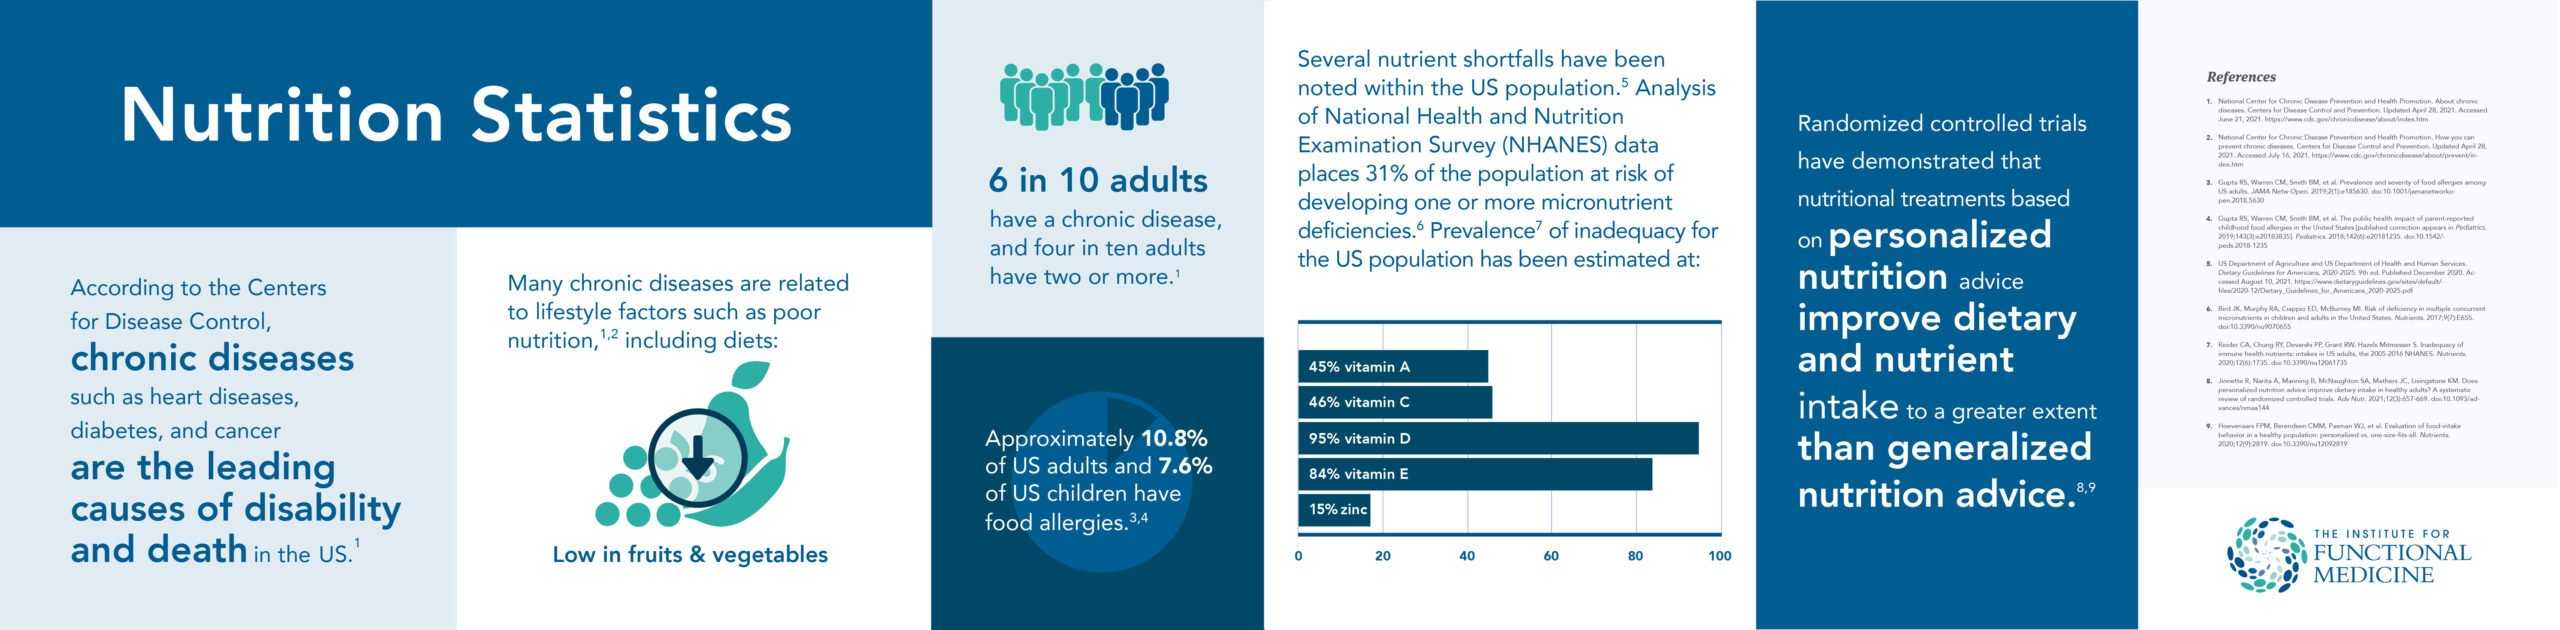 Nutrition Statistics TFP Infographic Horizontal (2)